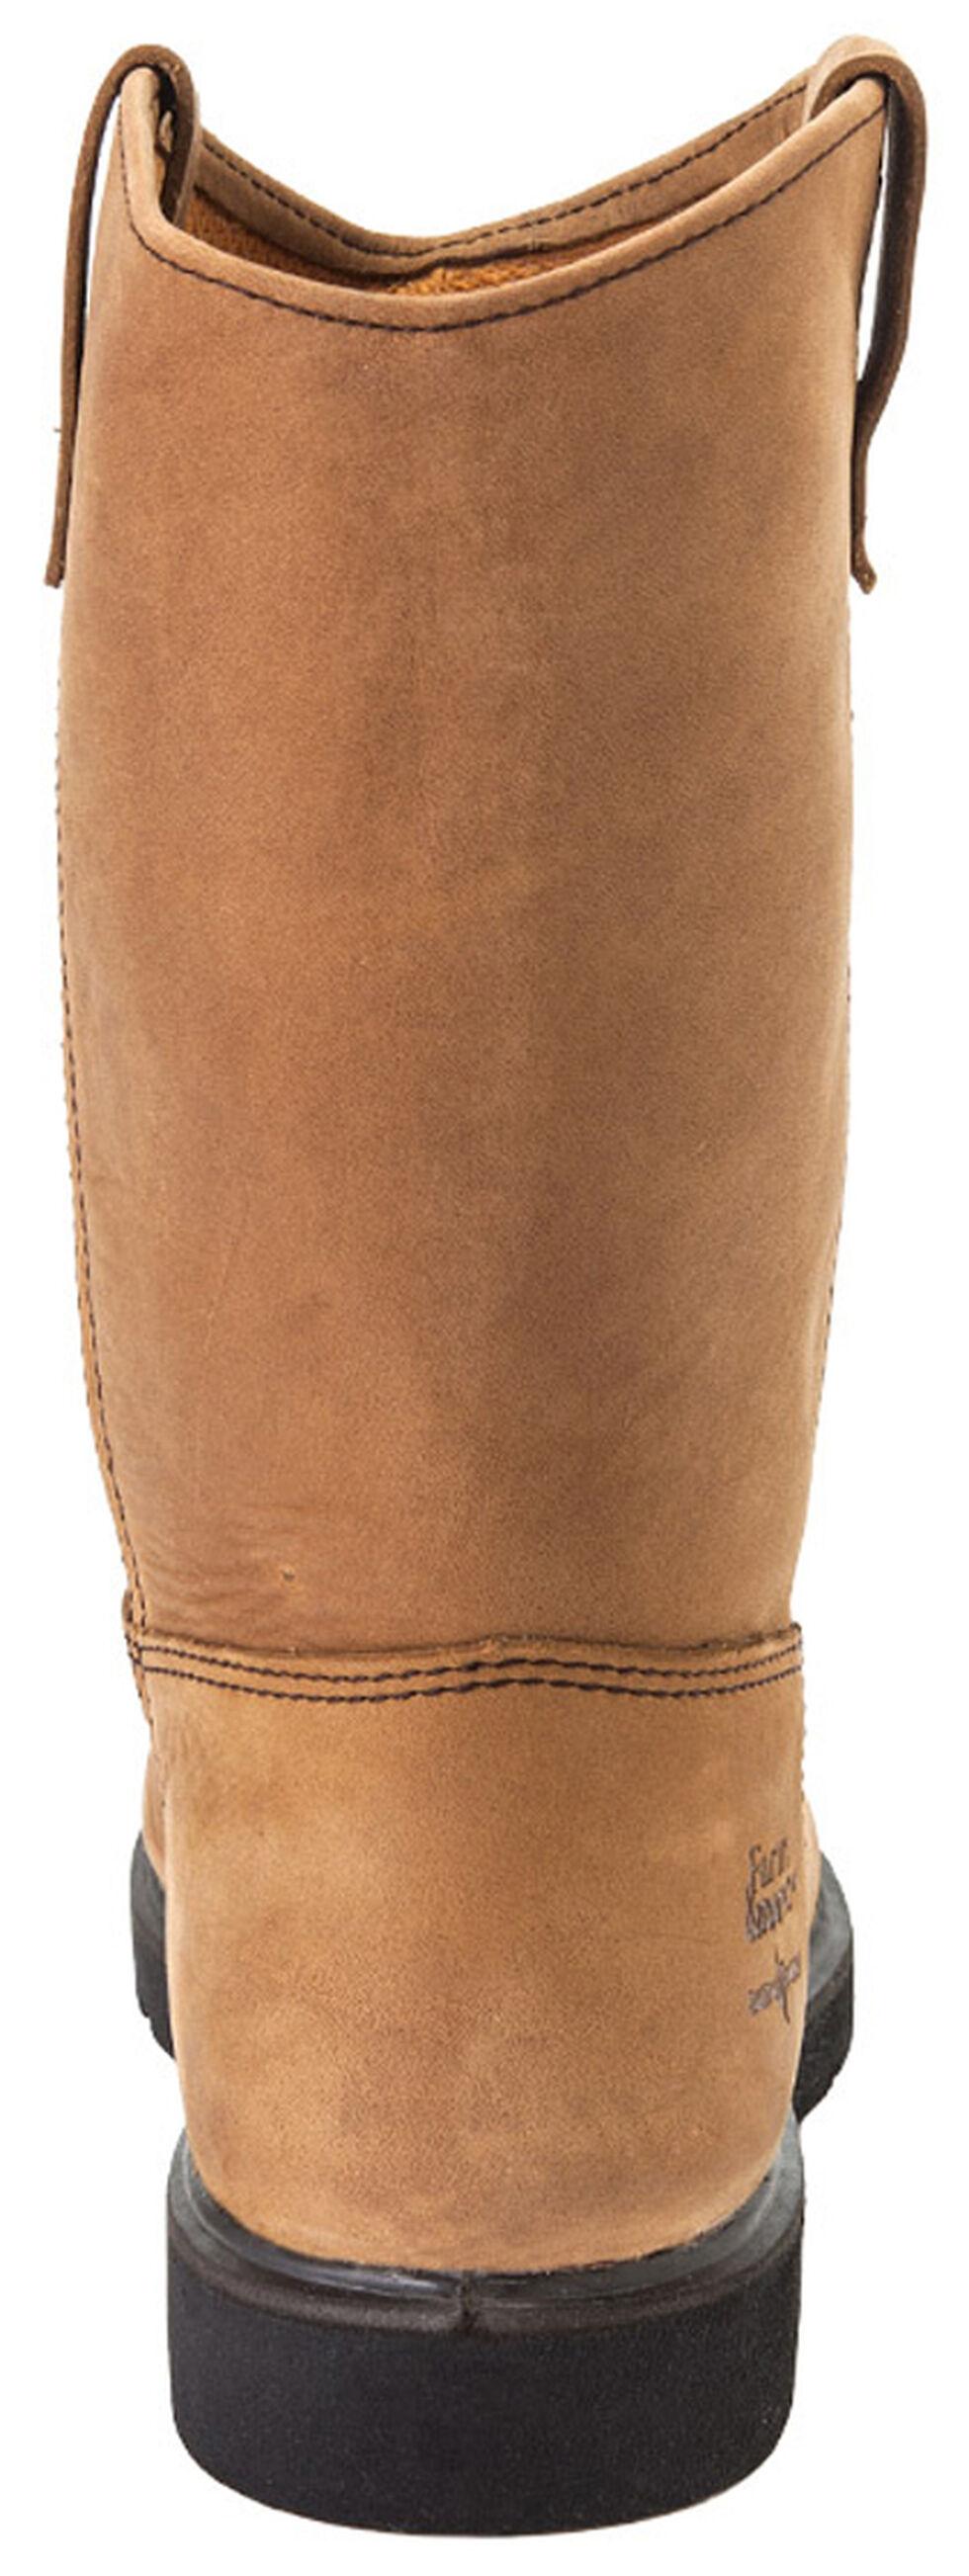 Georgia Farm and Ranch Wellington Boots - Round Toe, Tan, hi-res